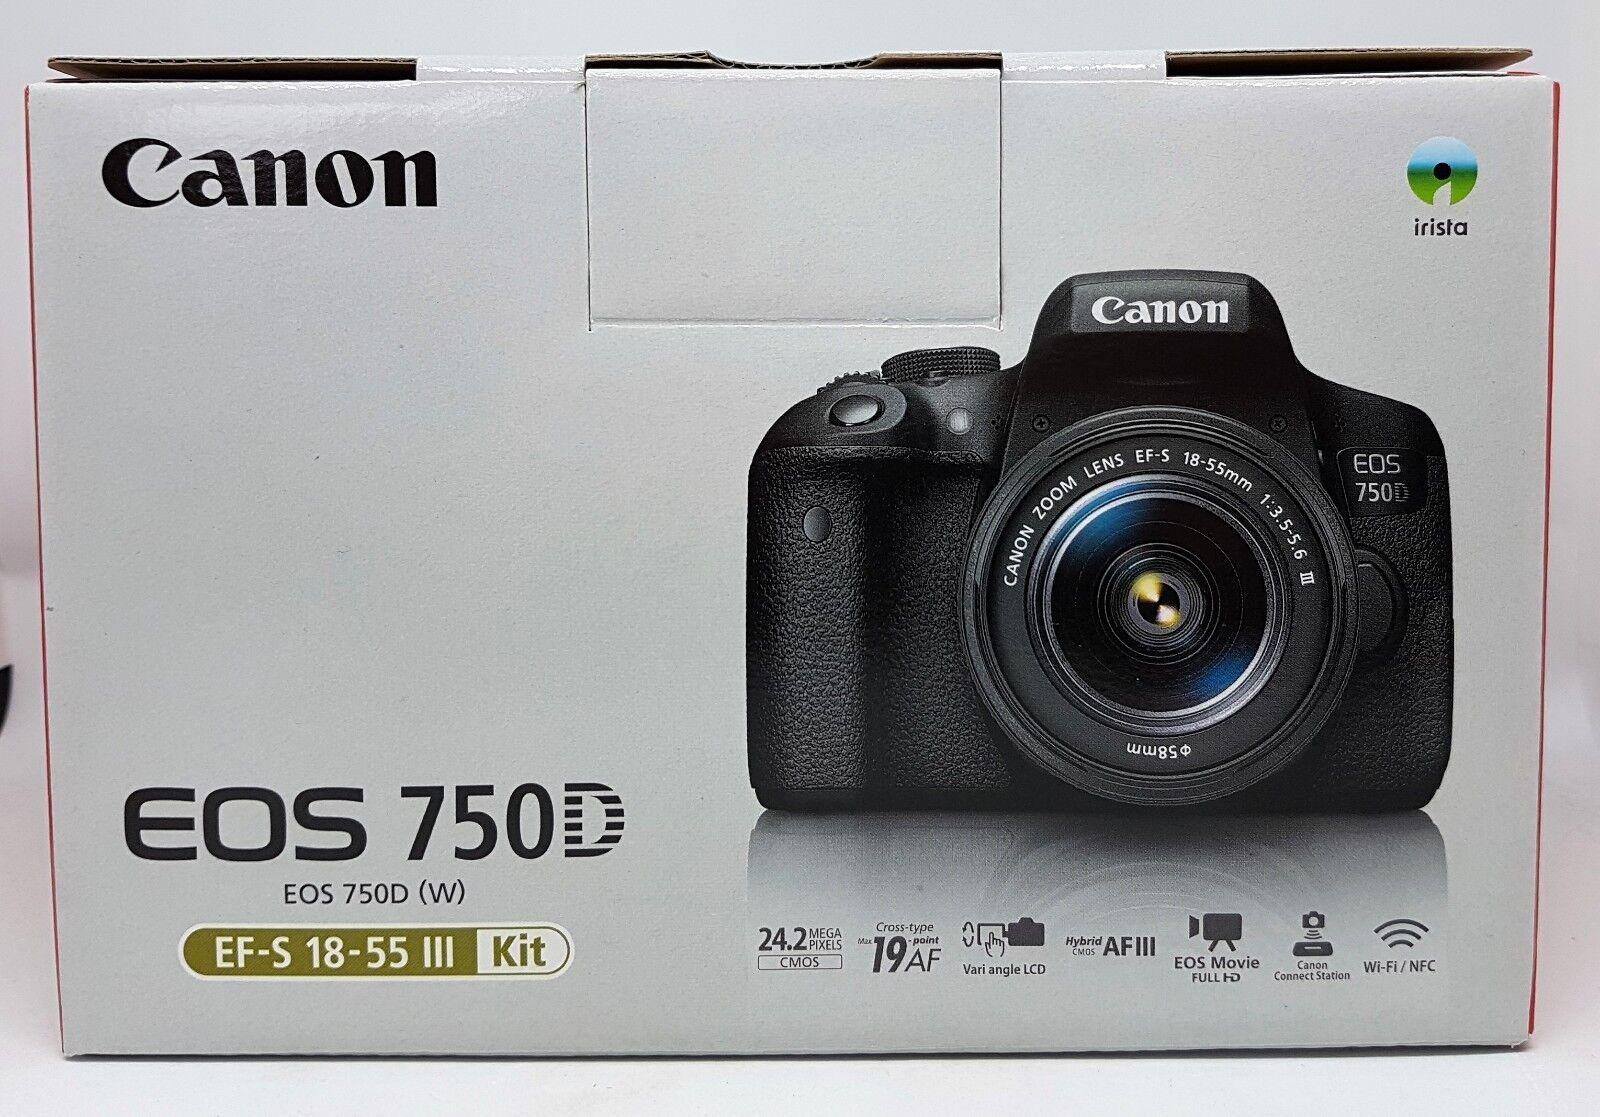 Canon EOS 750D APPAREIL PHOTO REFLEX 24.2 MP KIT + EF-S 18-55 III objectif Neuf